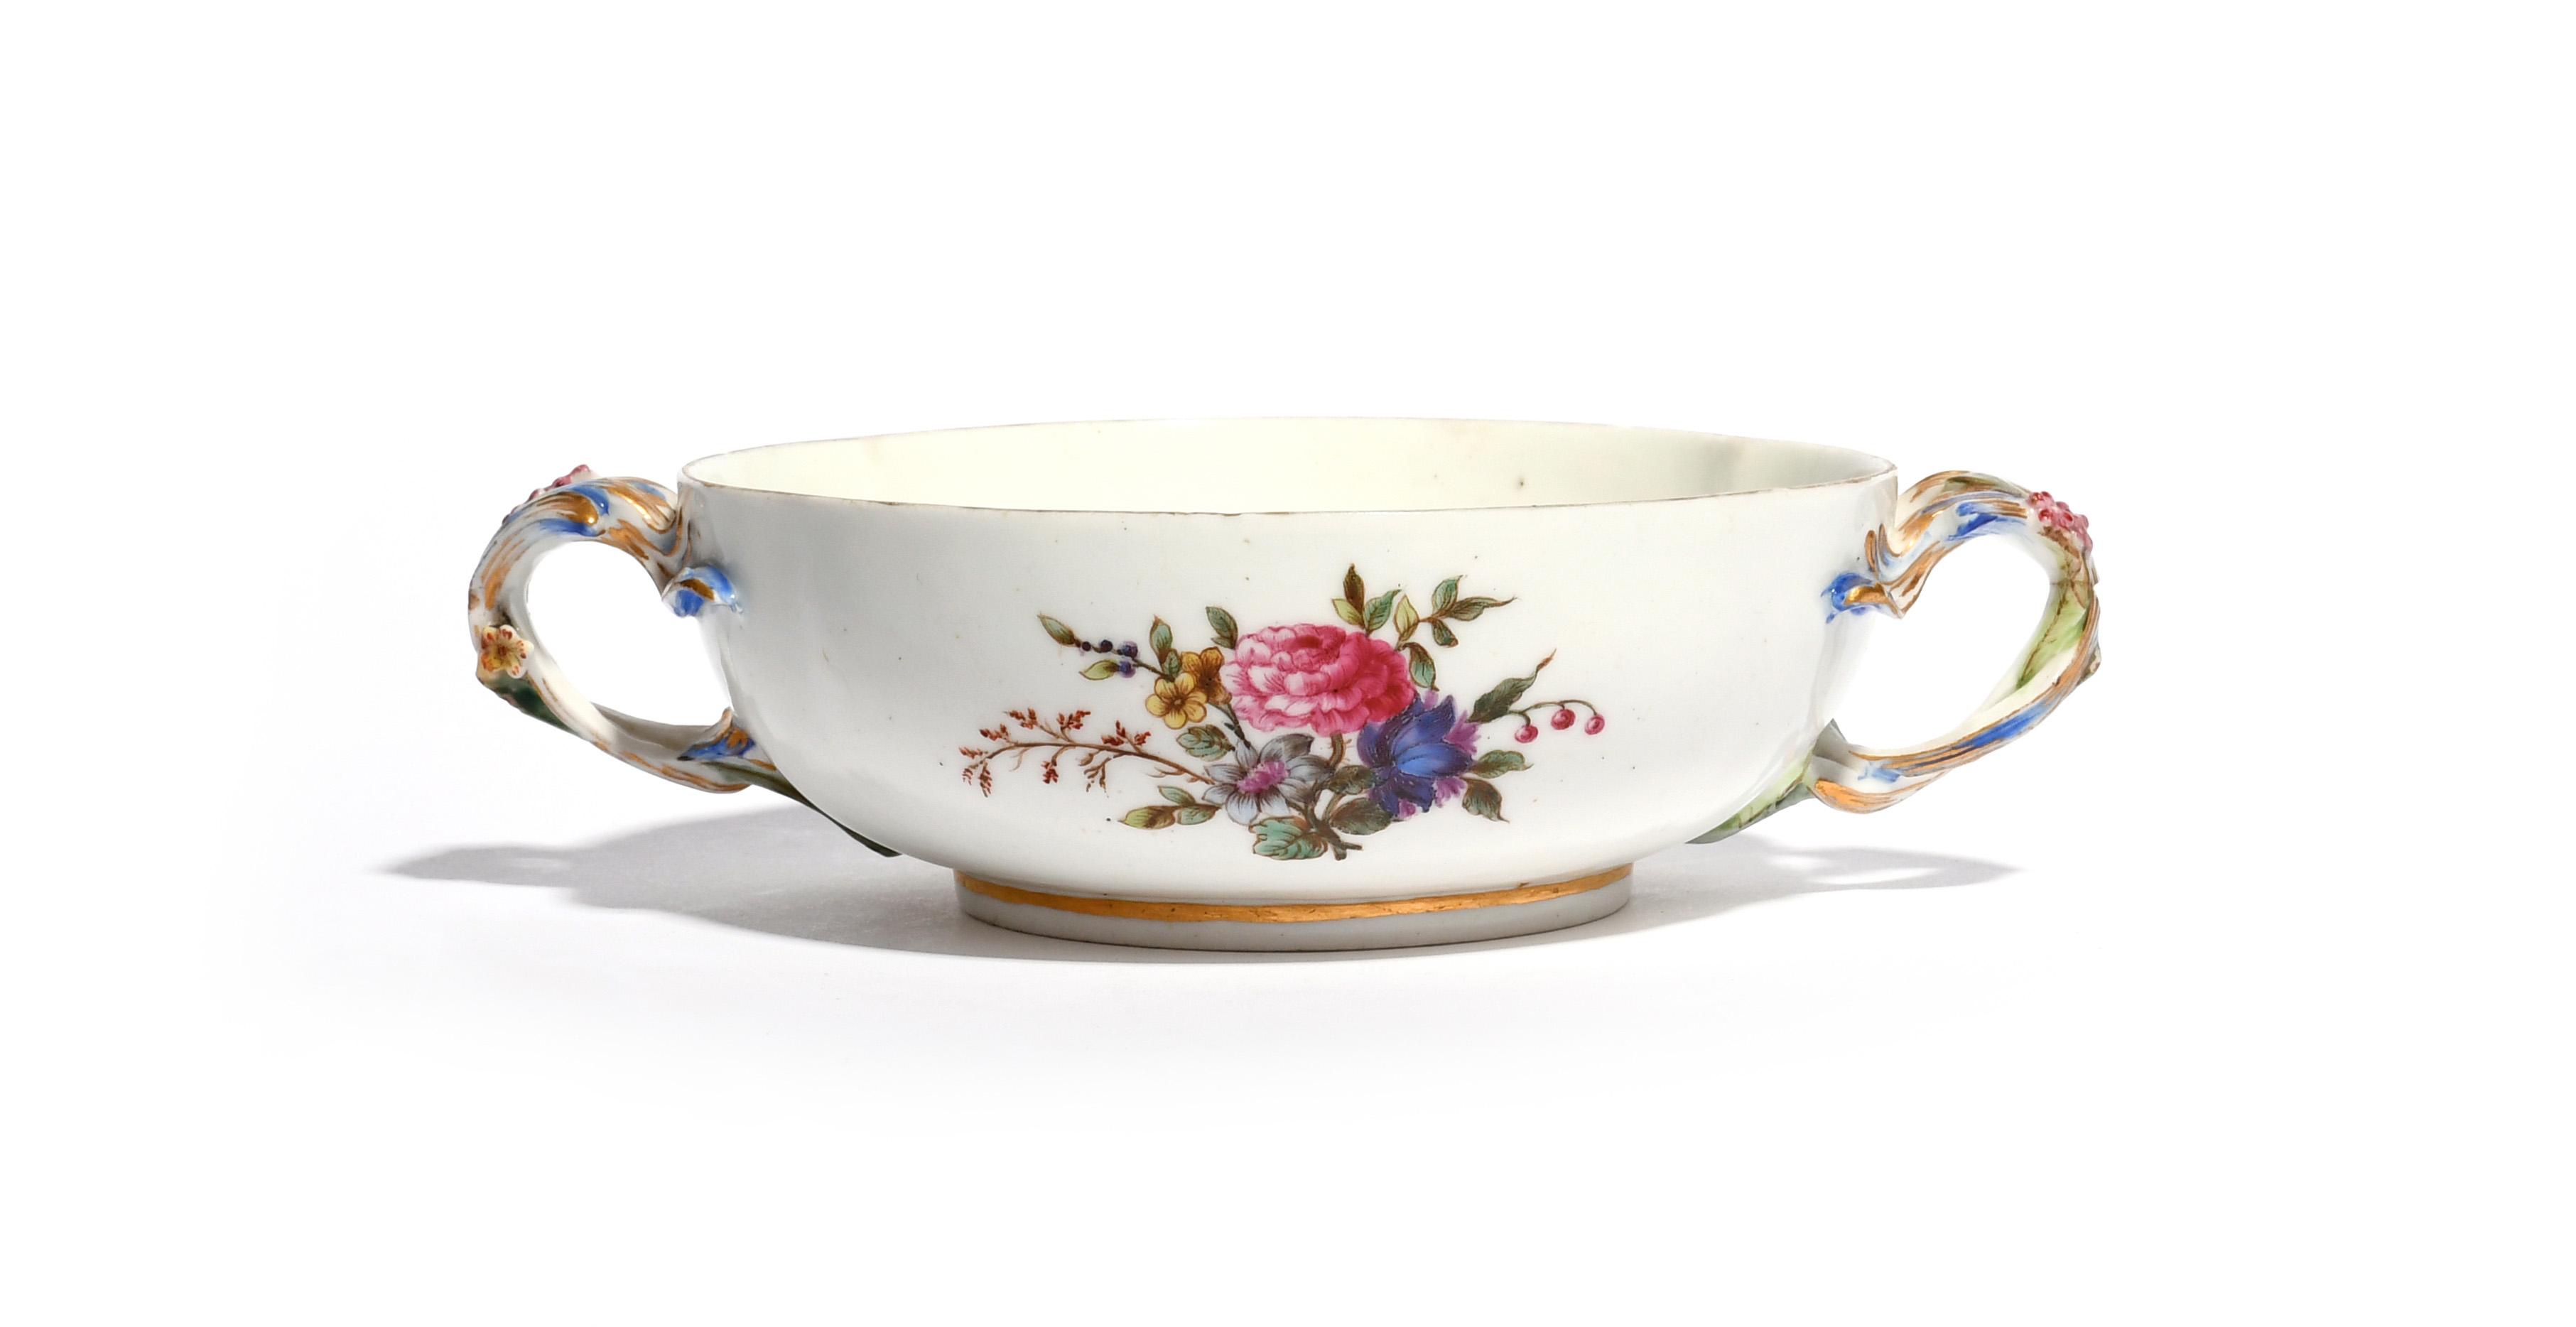 A Vincennes broth bowl or ecuelle (écuelle ronde) c.1749-53, the squat circular form painted with